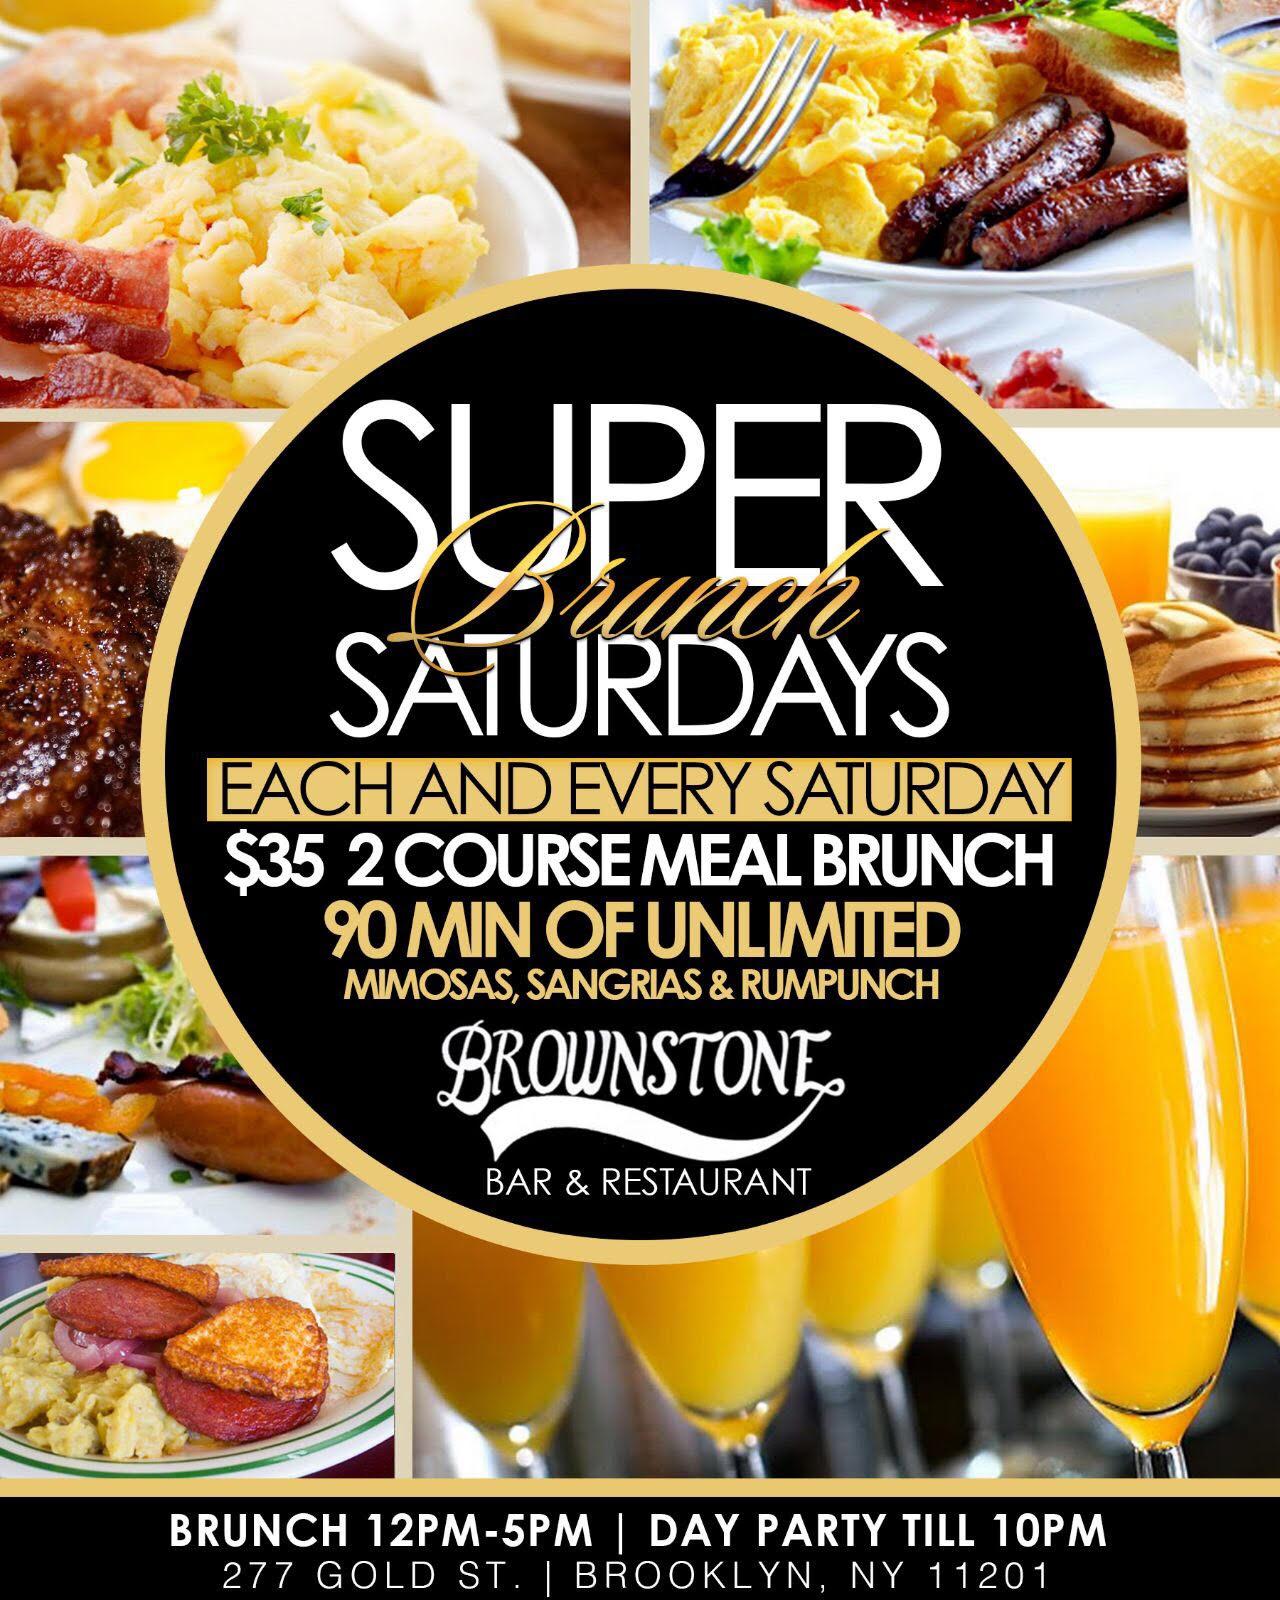 Super Brunch Saturdays Flyer